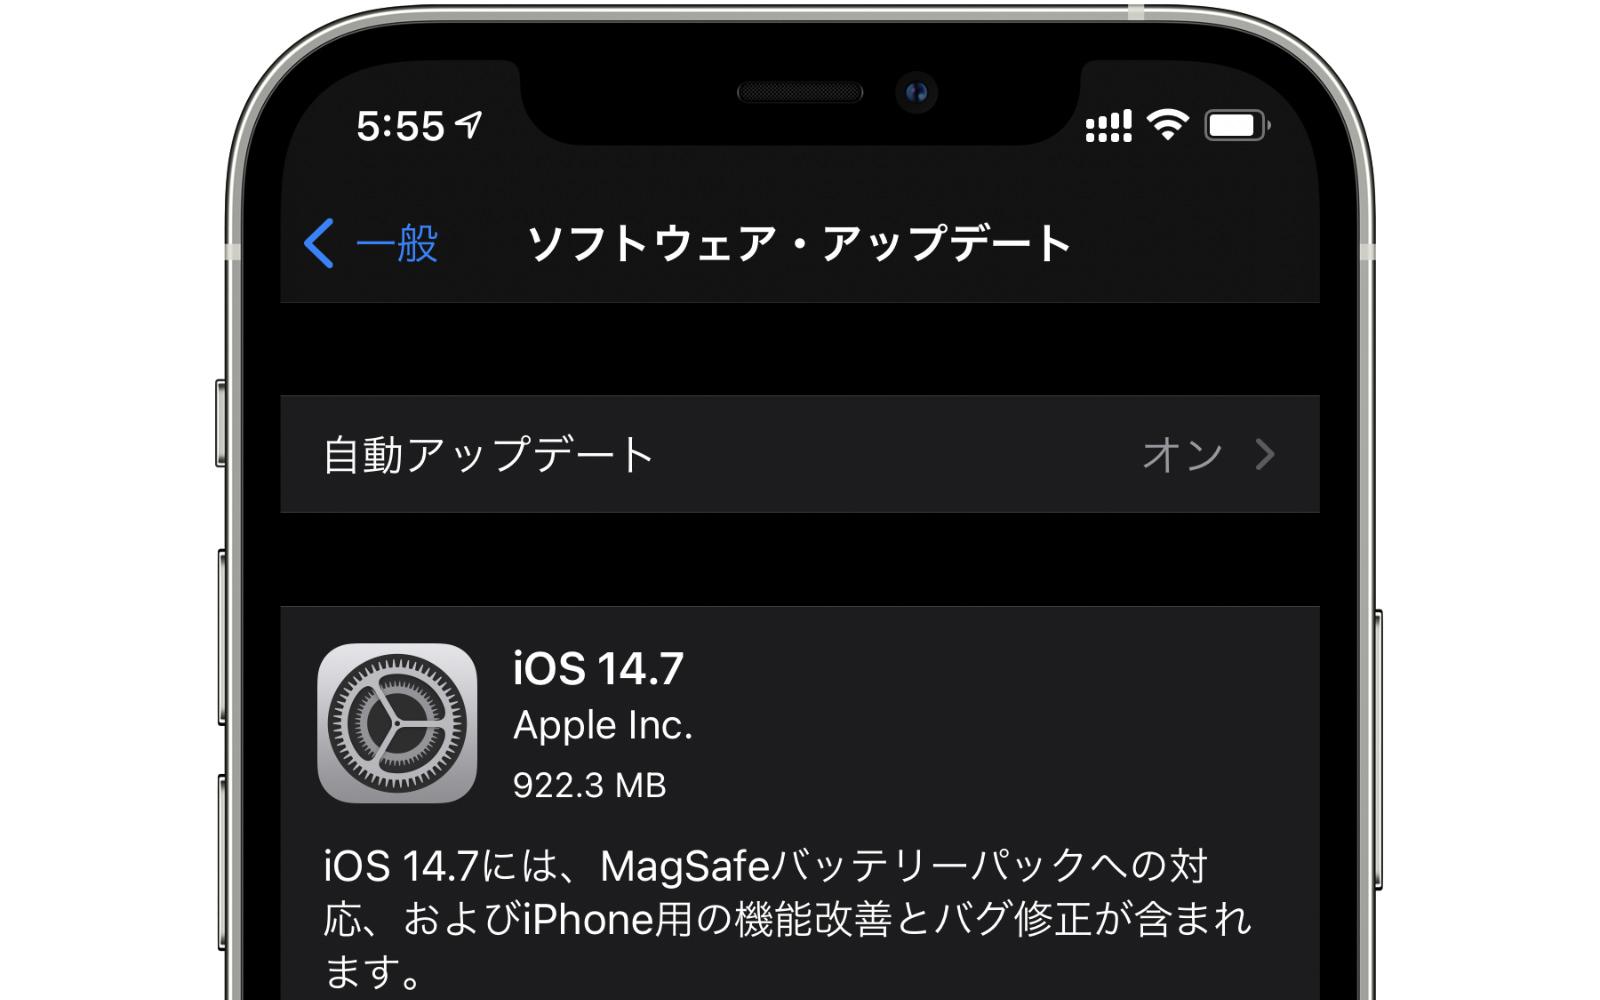 IOS14 7 software update